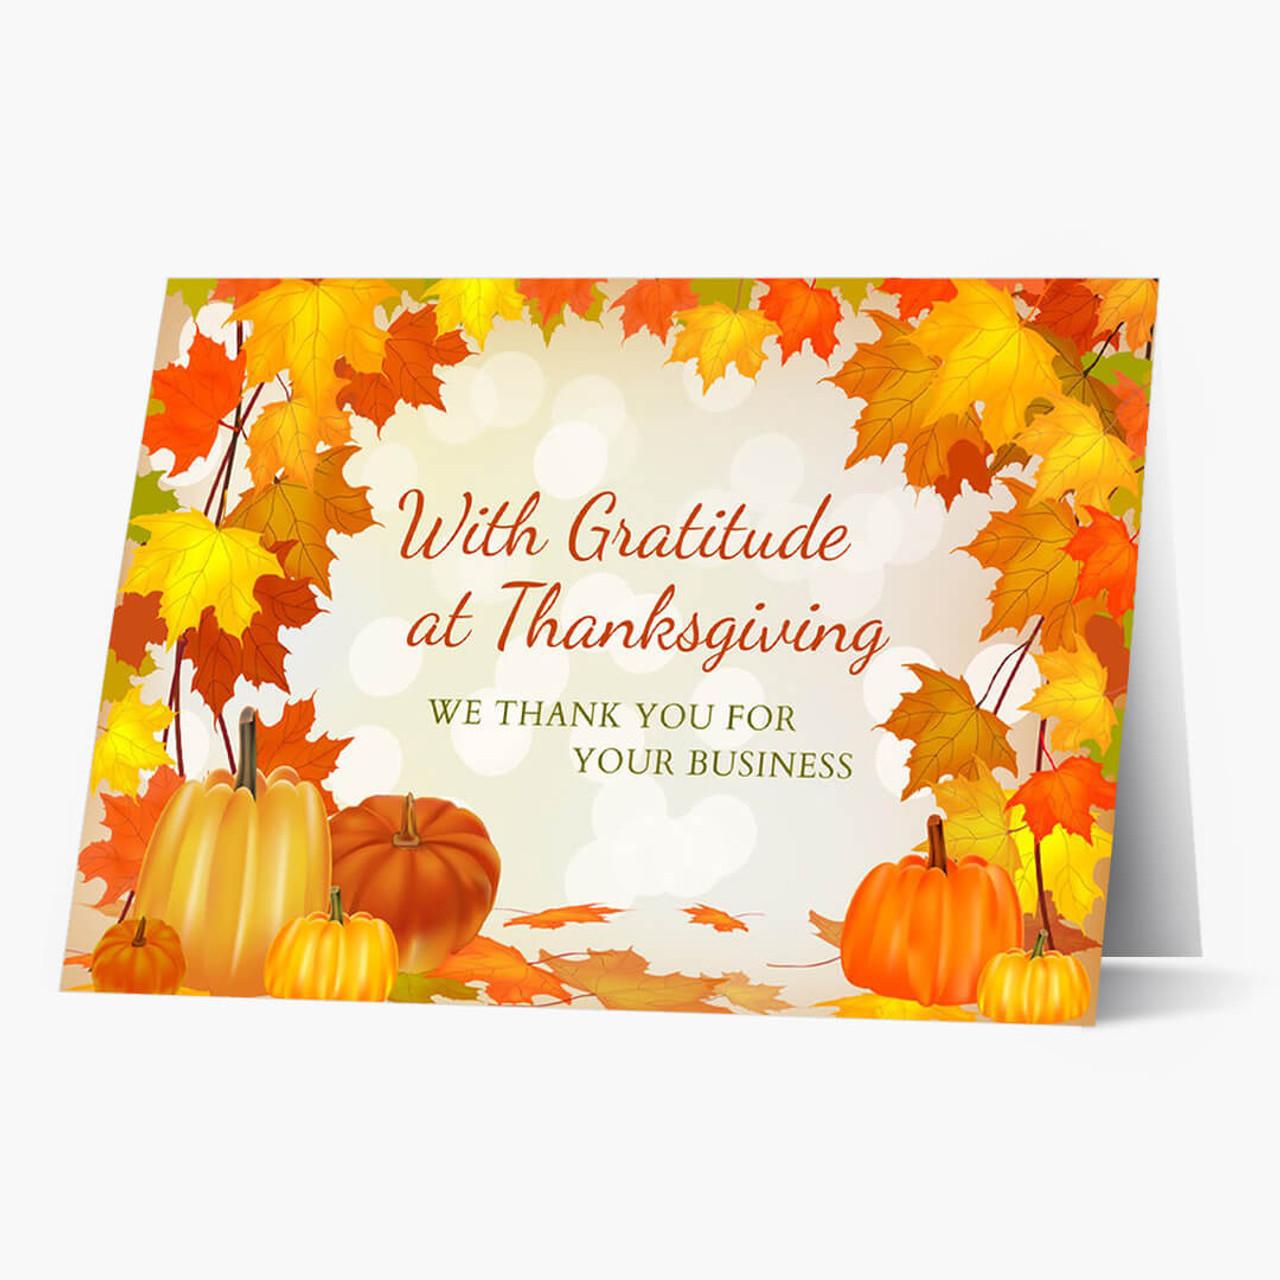 Business Gratitude Thanksgiving Card